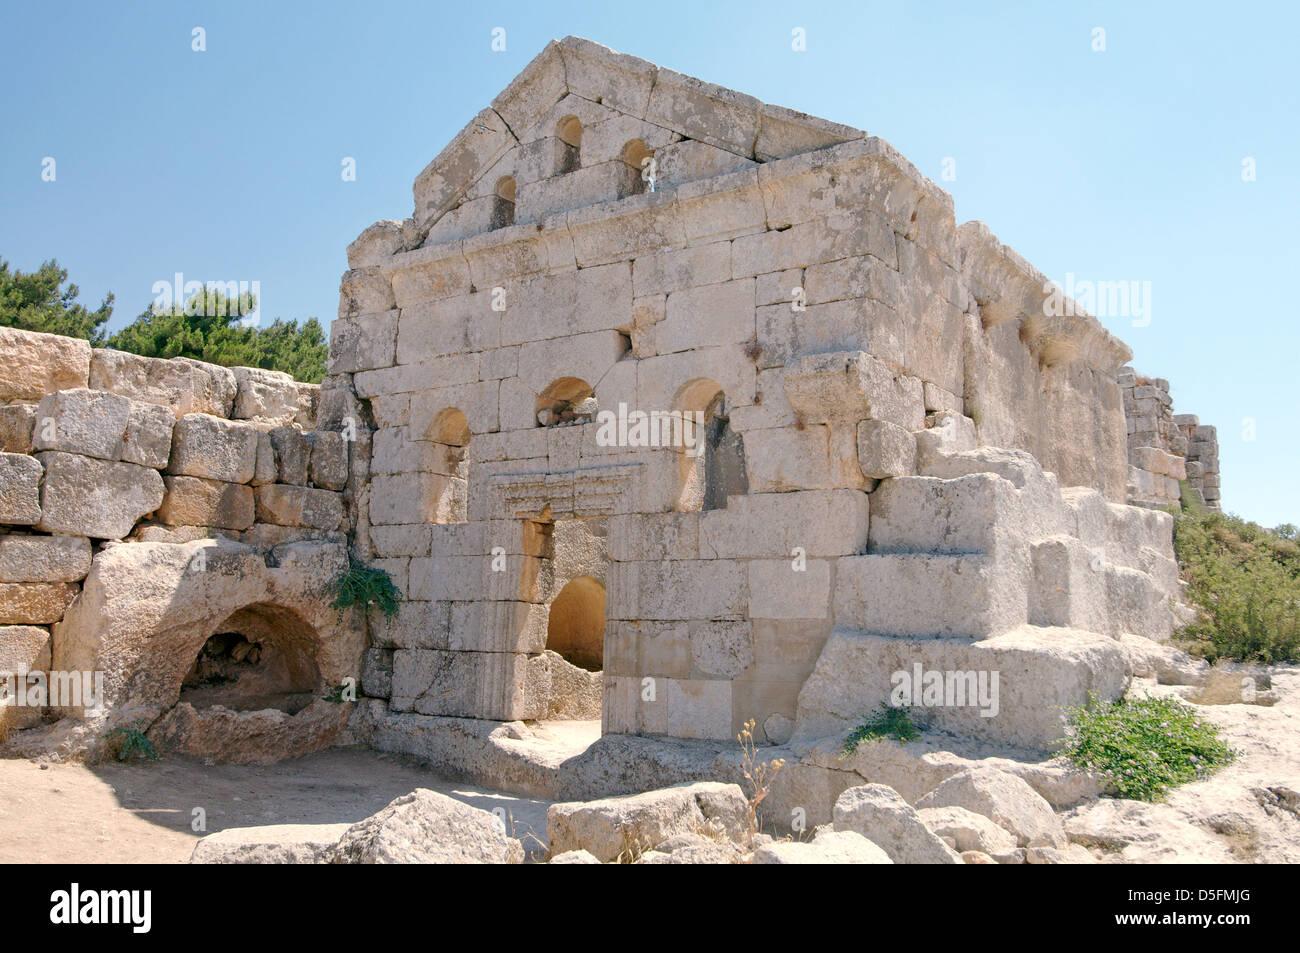 Ruins of the Church of Saint Simeon Stylites, Syria - Stock Image